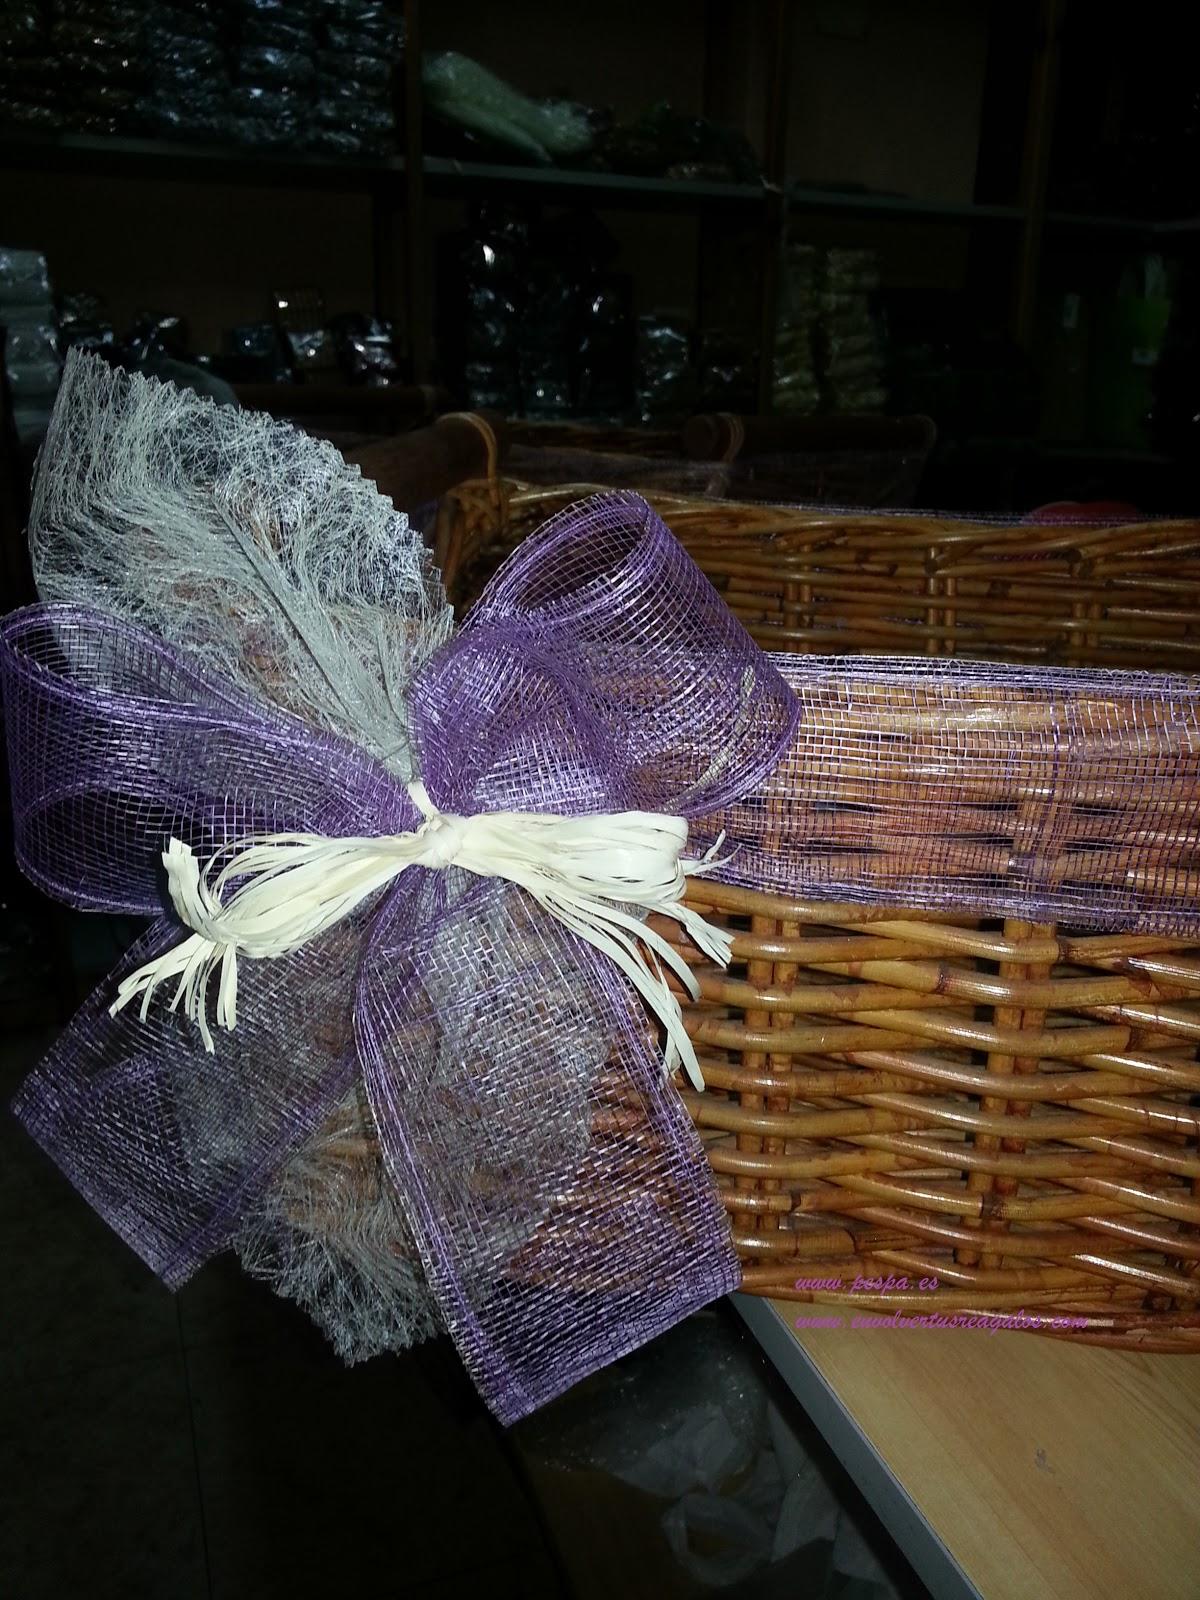 Envolver tus regalos pespa cesta decorada con jute - Como decorar una cesta de mimbre ...